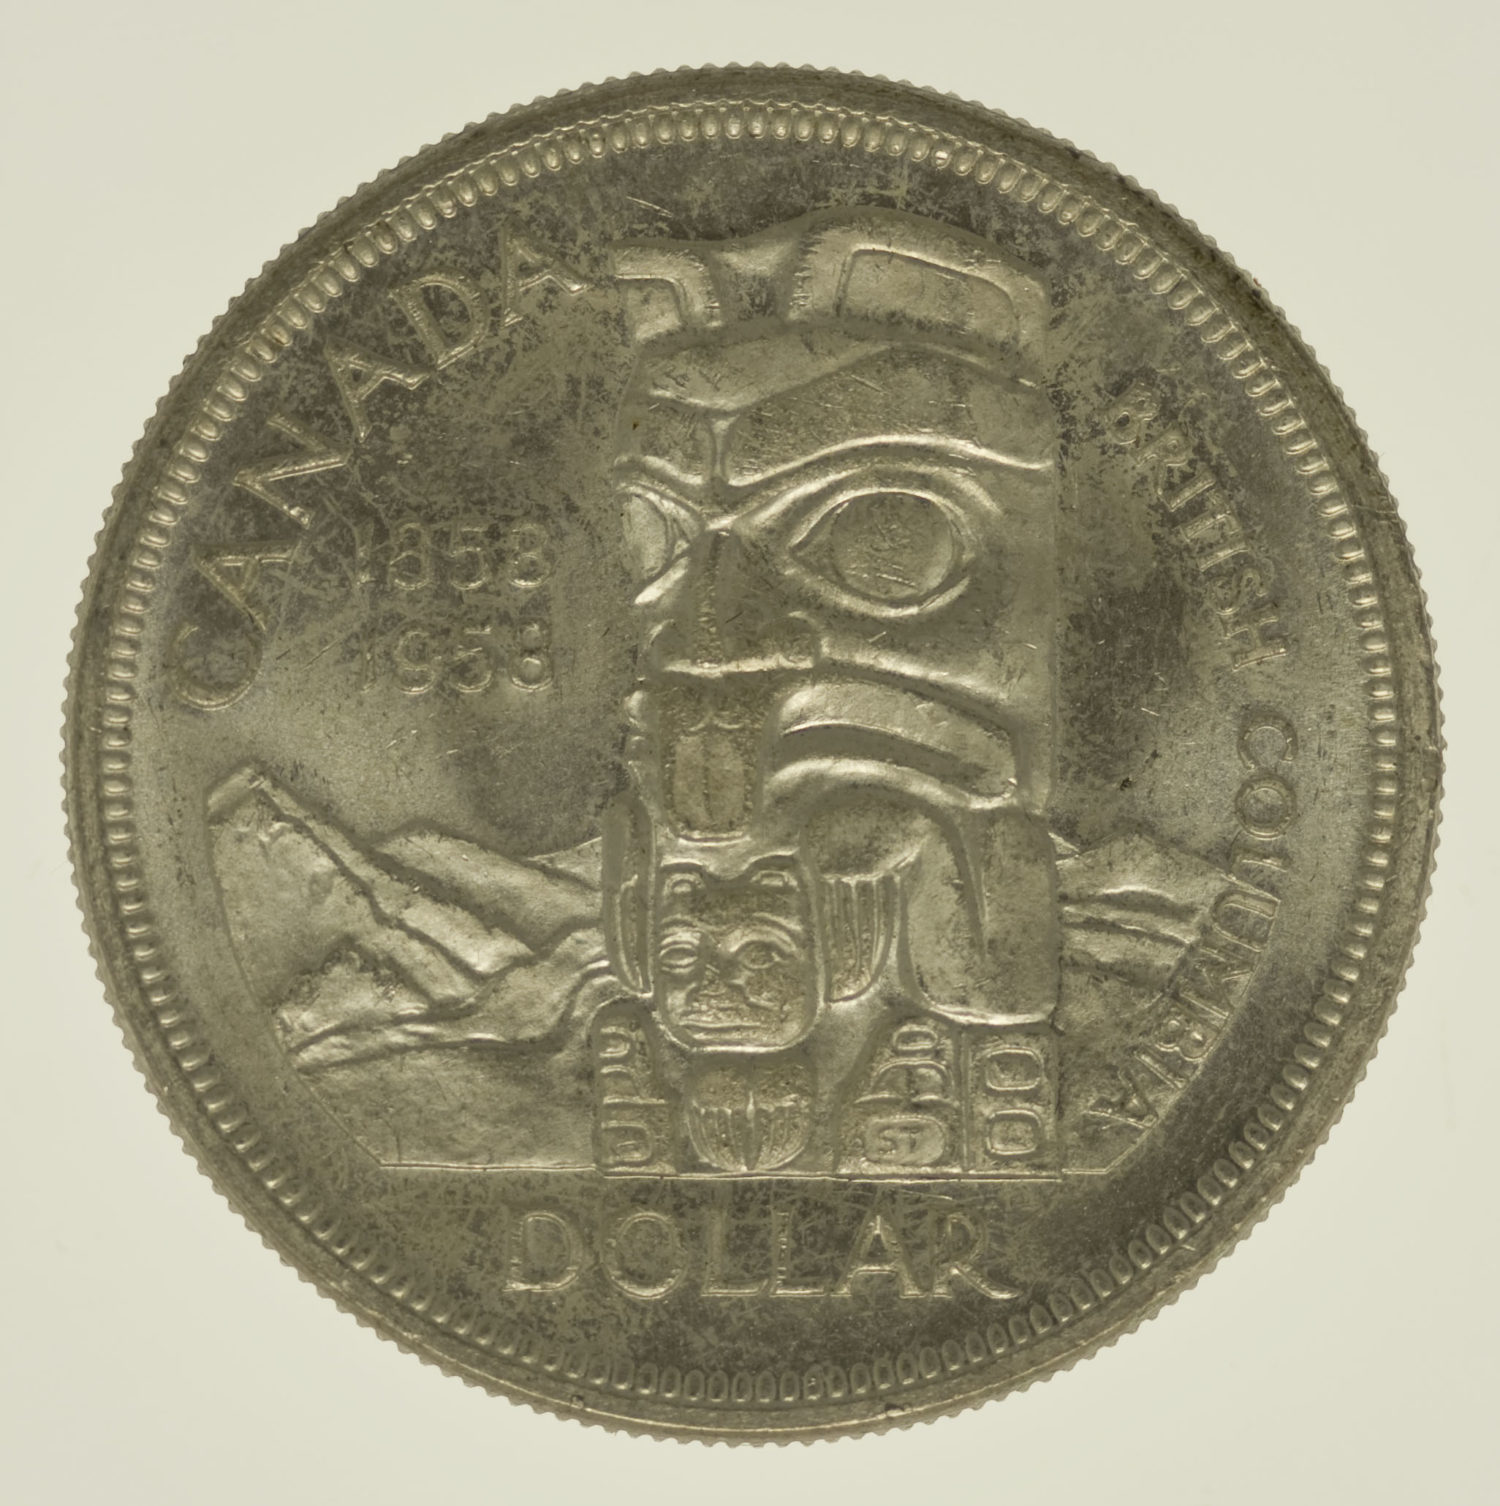 kanada-silbermuenzen-uebrige-welt - Kanada Elisabeth II. Dollar 1958 Lot